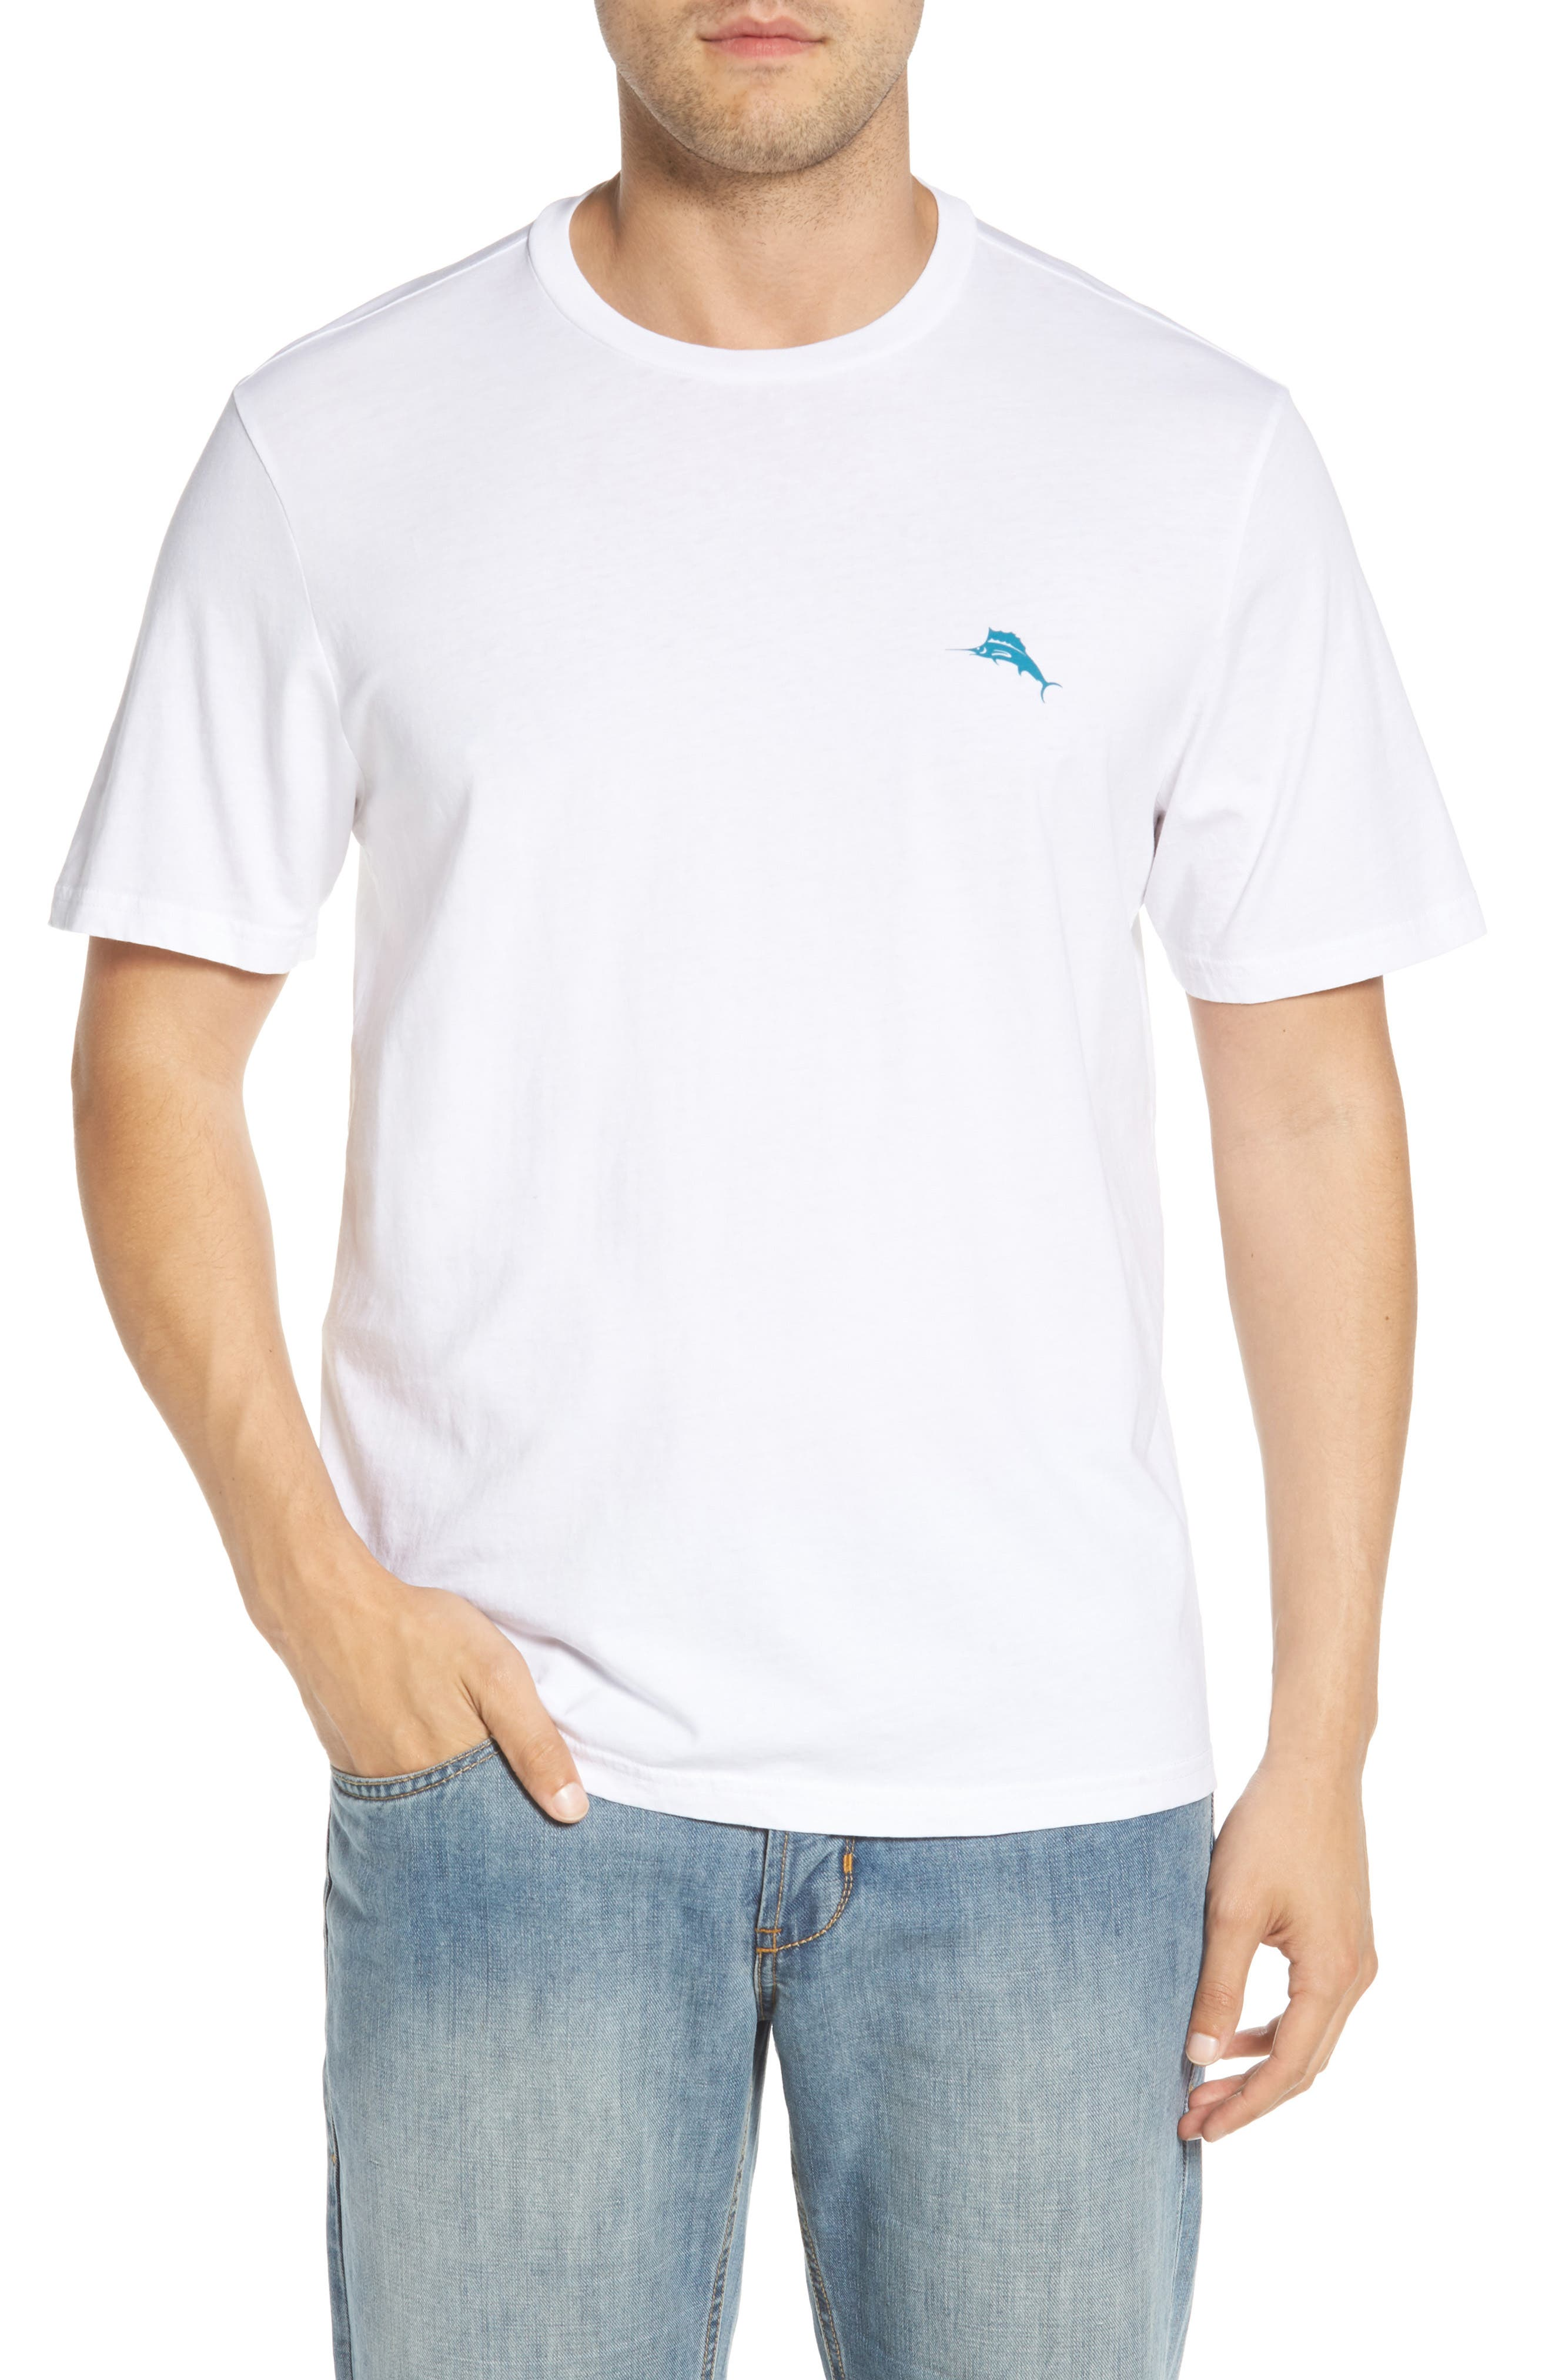 Parrot Pair T-Shirt,                             Main thumbnail 1, color,                             WHITE